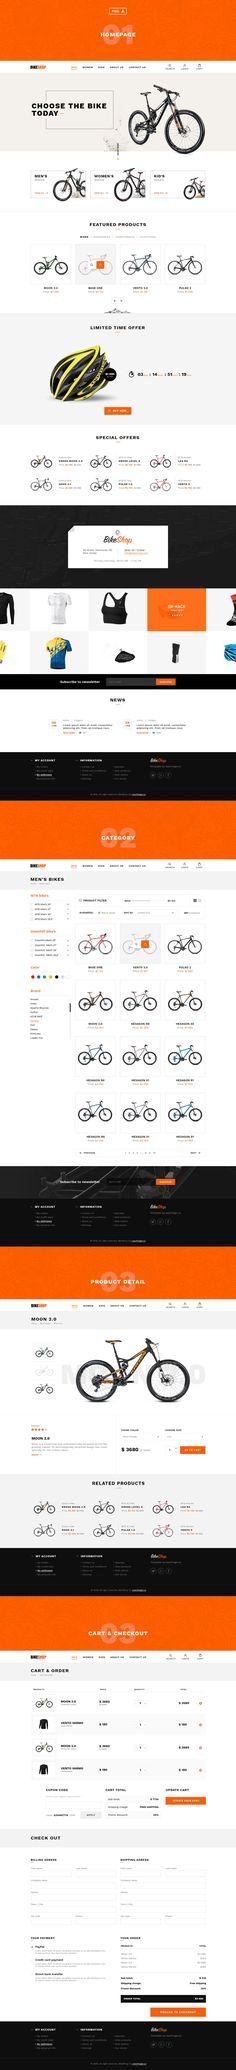 Bikehop by Marek Leschinger on @creativemarket